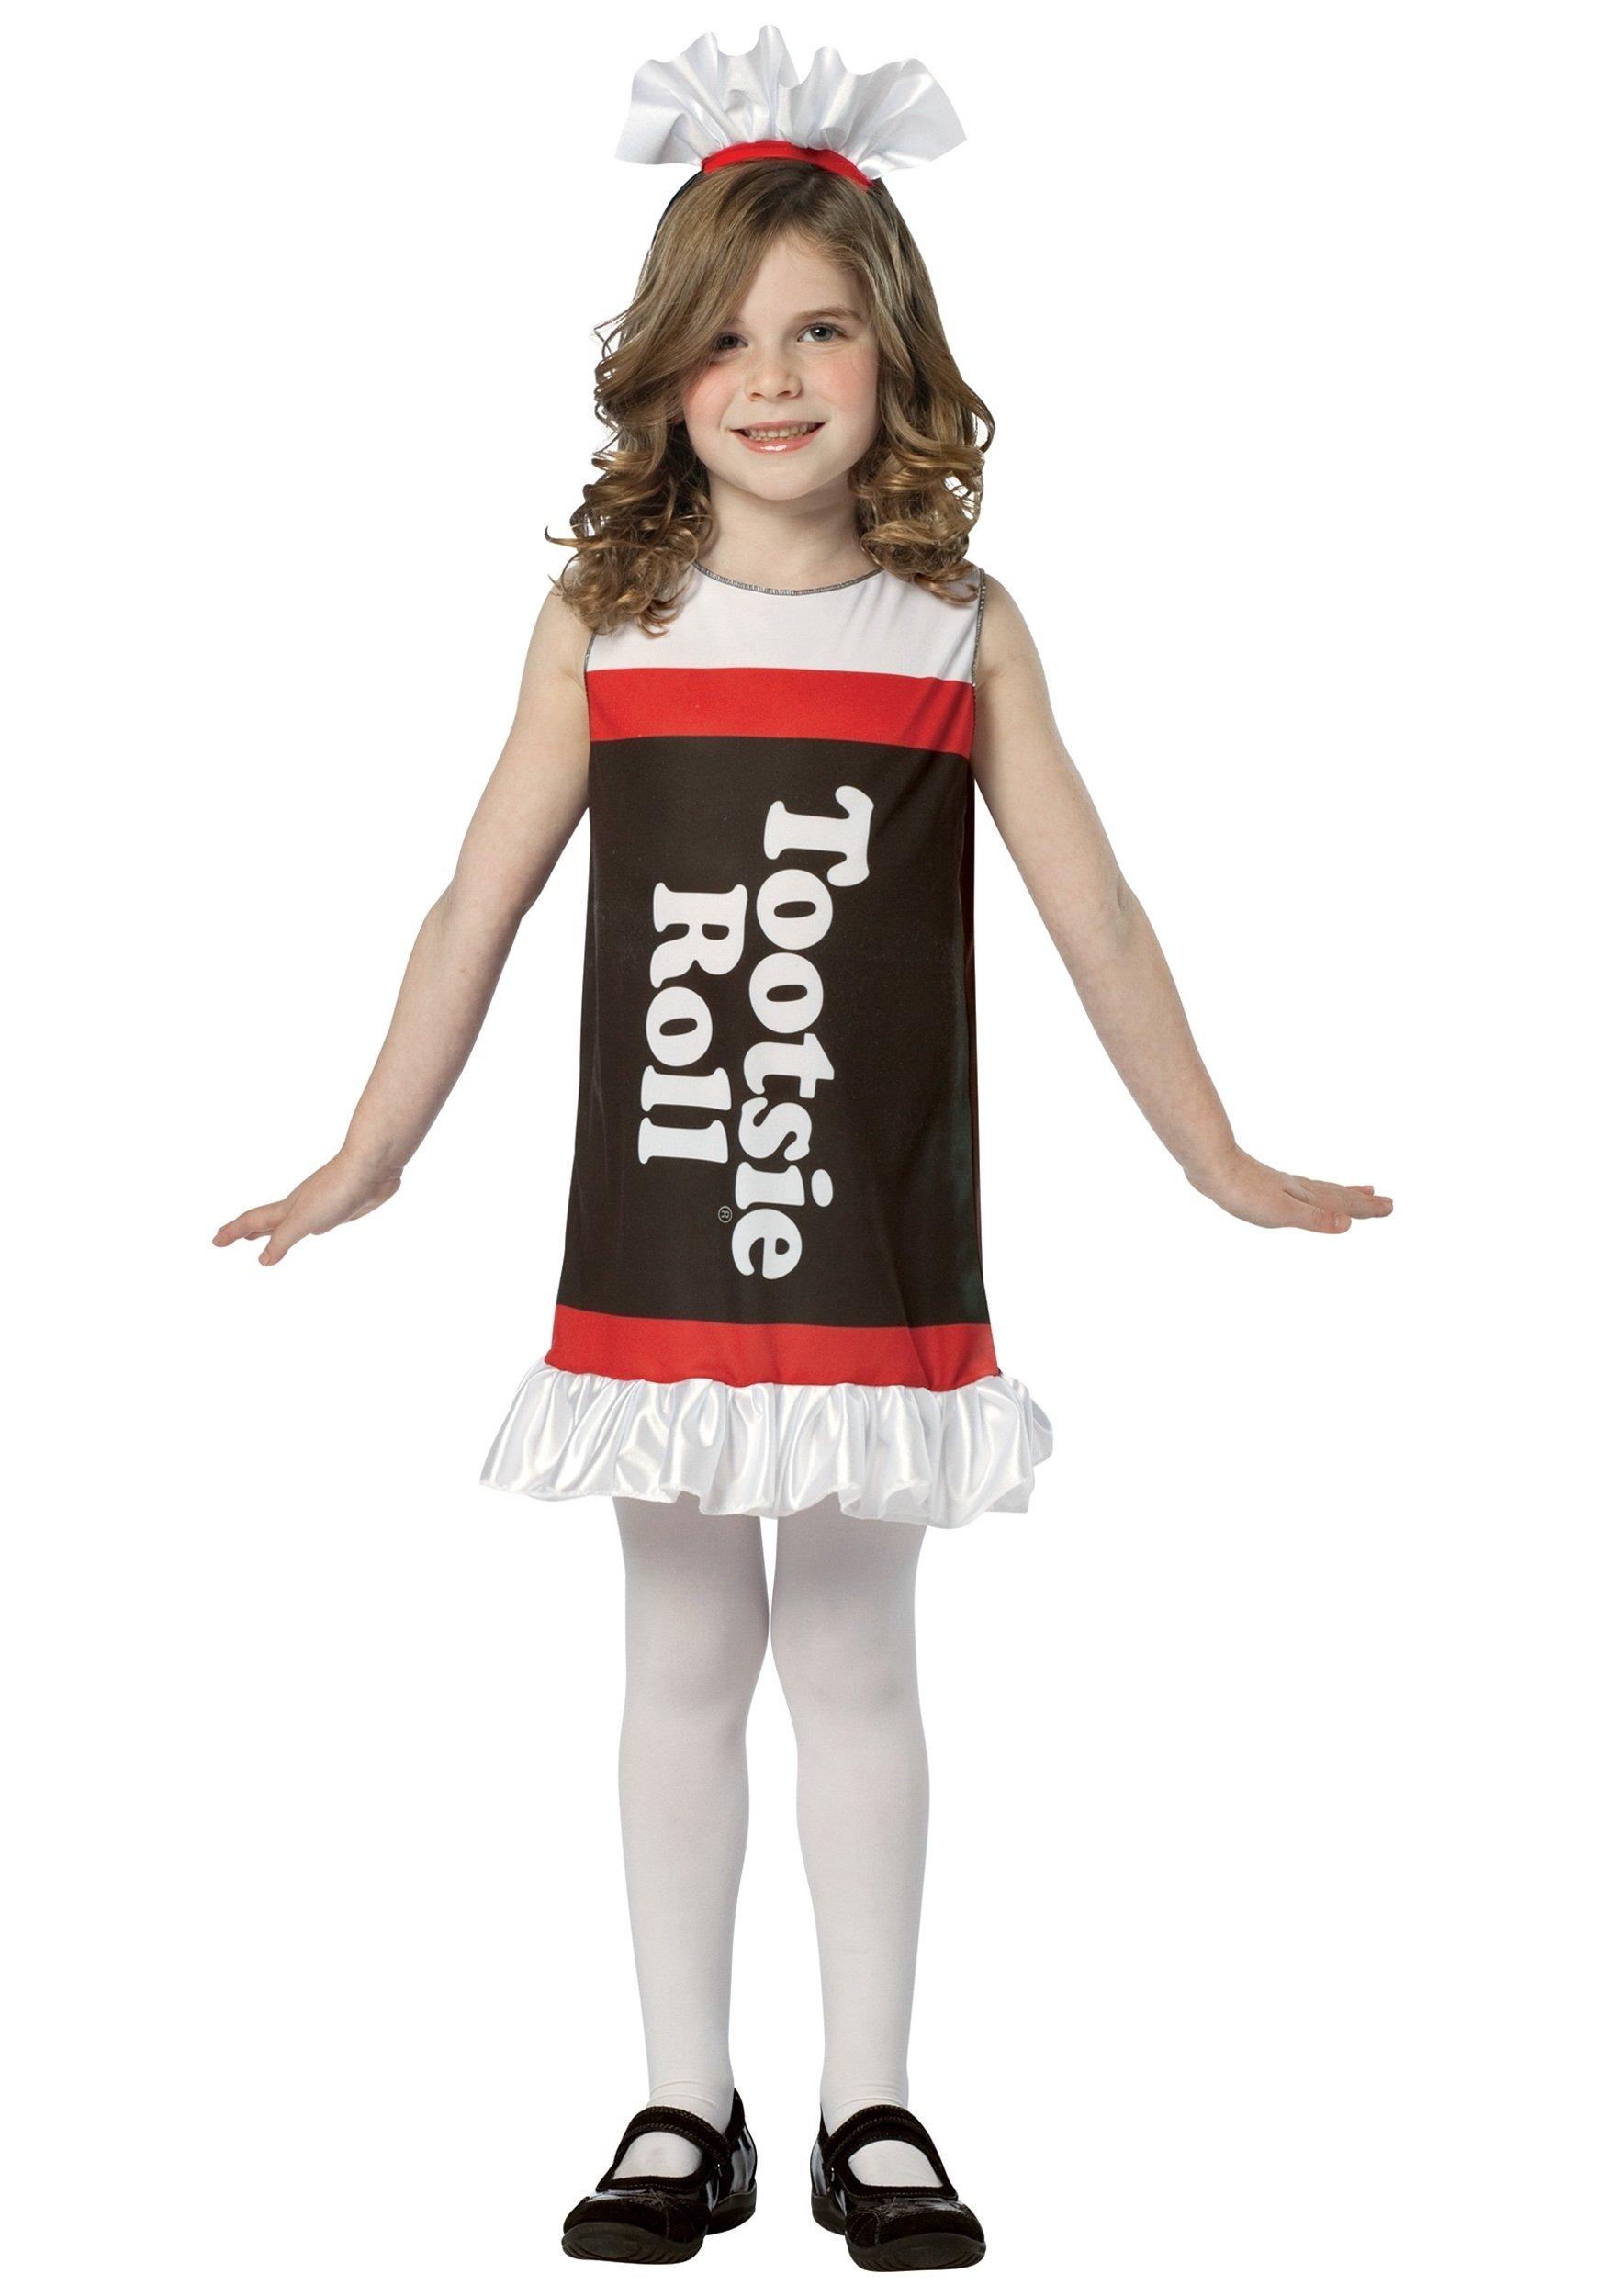 10 unique halloween costumes ideas for girls girls tootsie roll dress 11